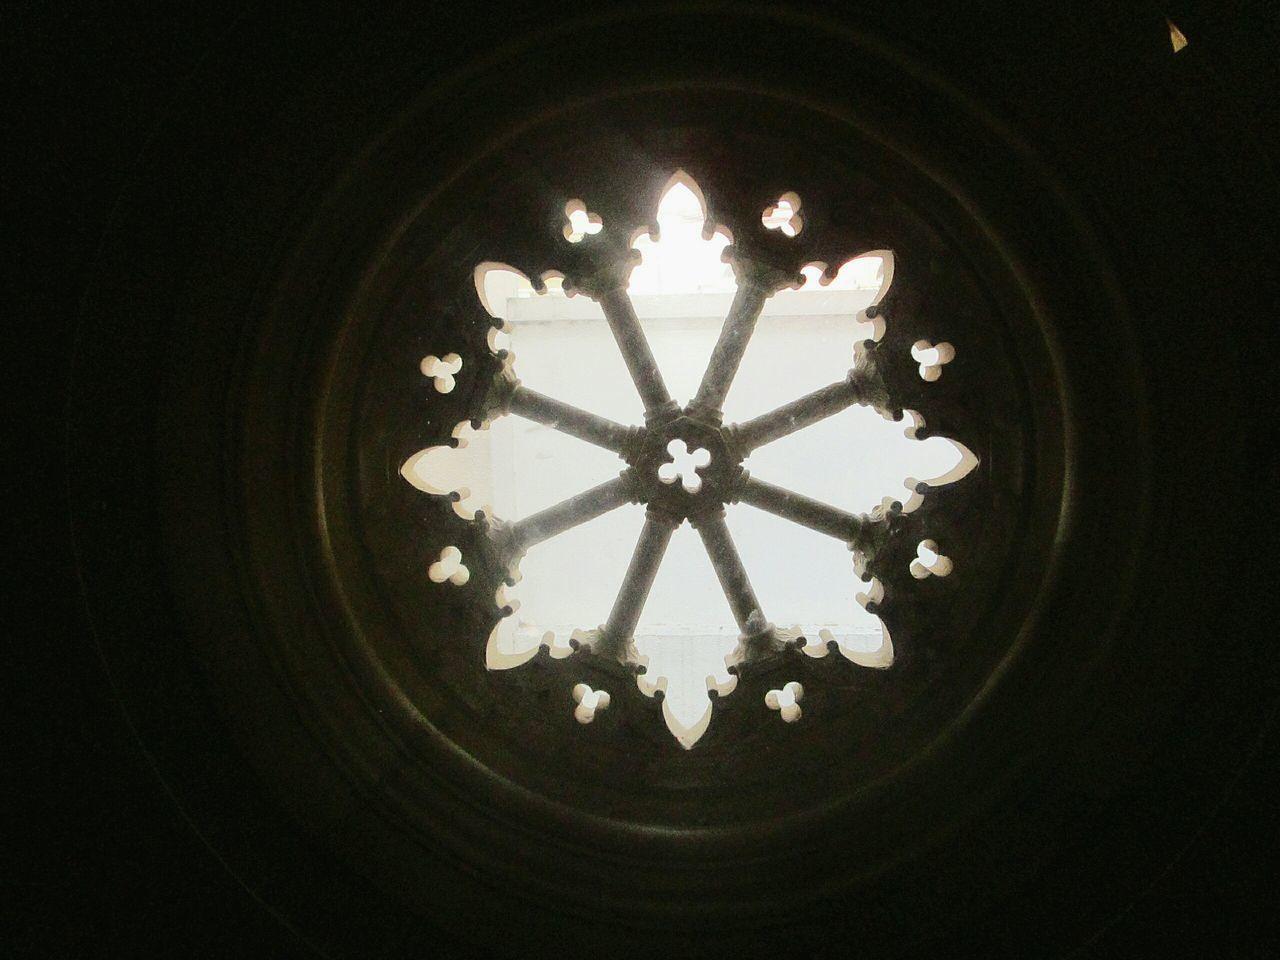 Window Circle Circular Window Circular Architecture Light Art Indoors  Built Structure No People Darkness And Light Dark Getting Inspired Circular Shape Taking Photos